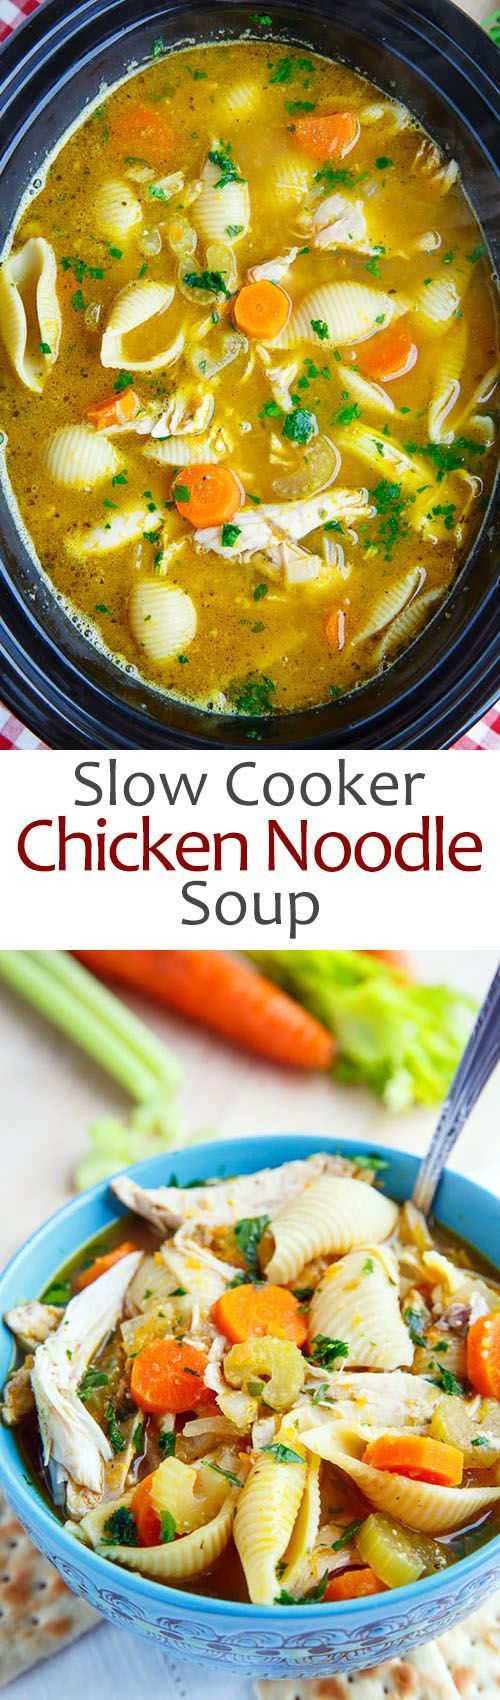 Best 25 chicken noodle soups ideas on pinterest for Best homemade chicken noodle soup recipe